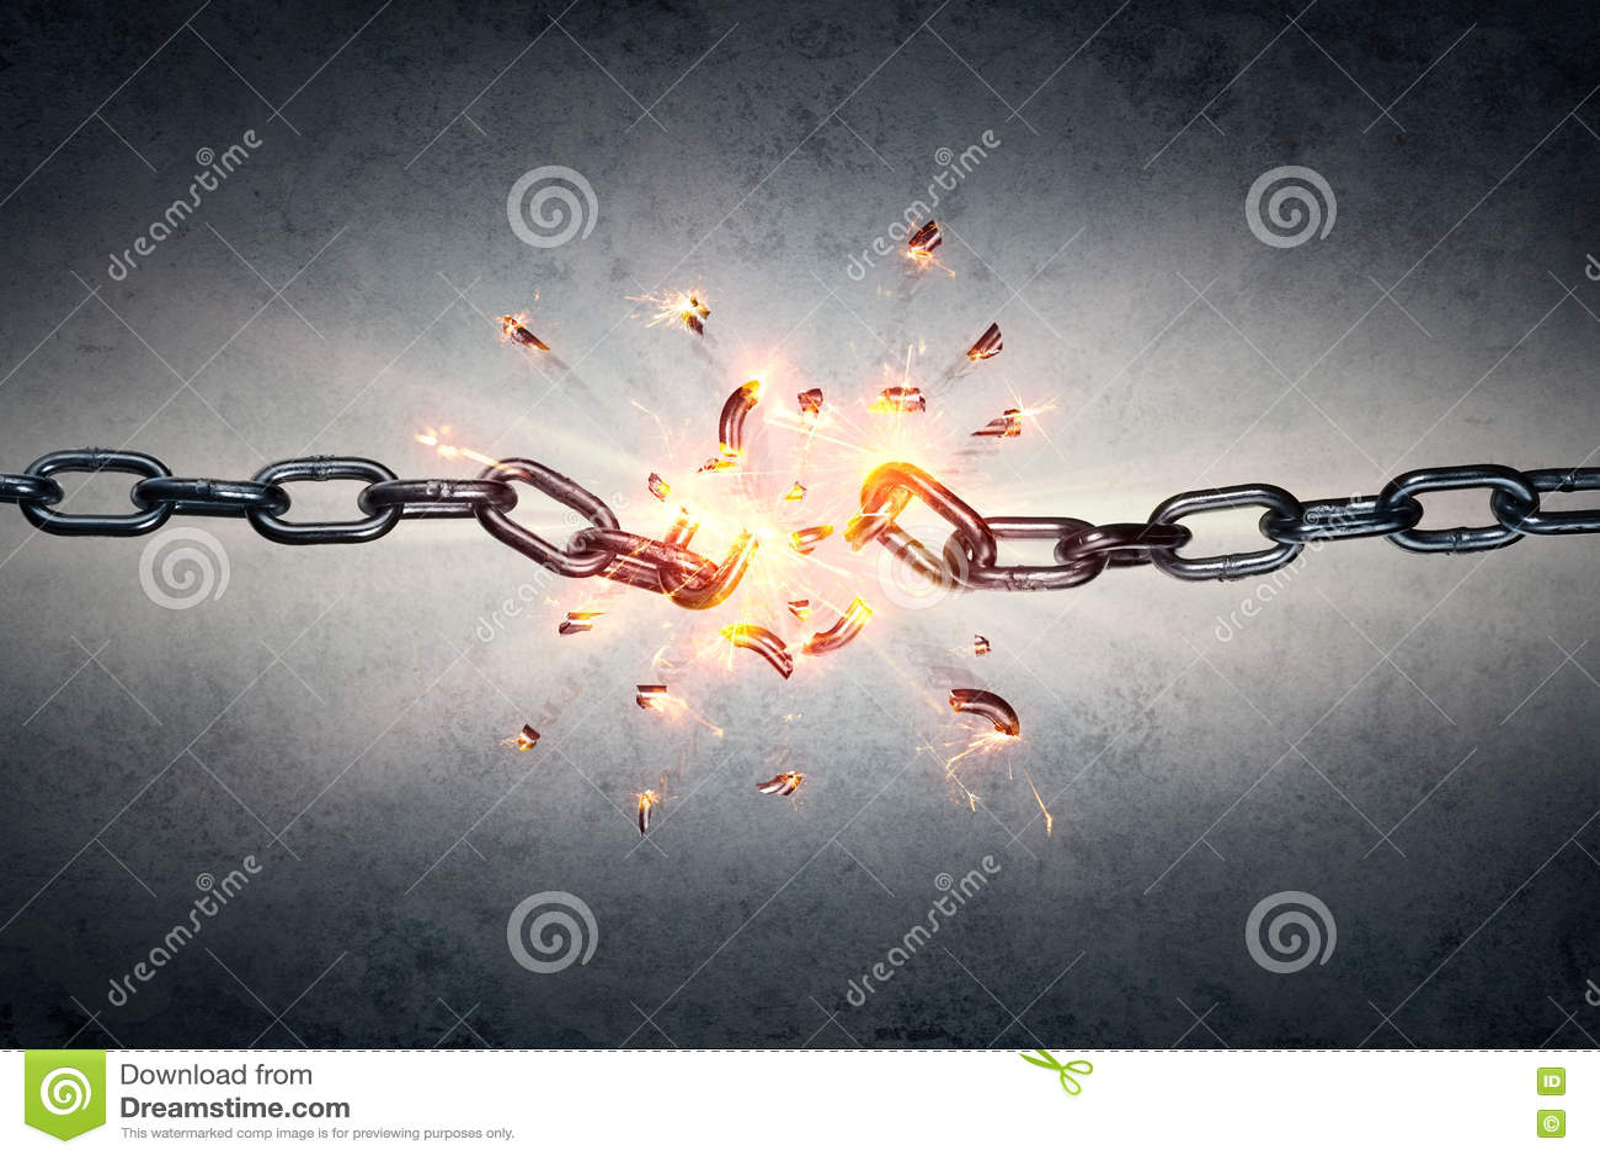 Catena rotta - libertà e separazione